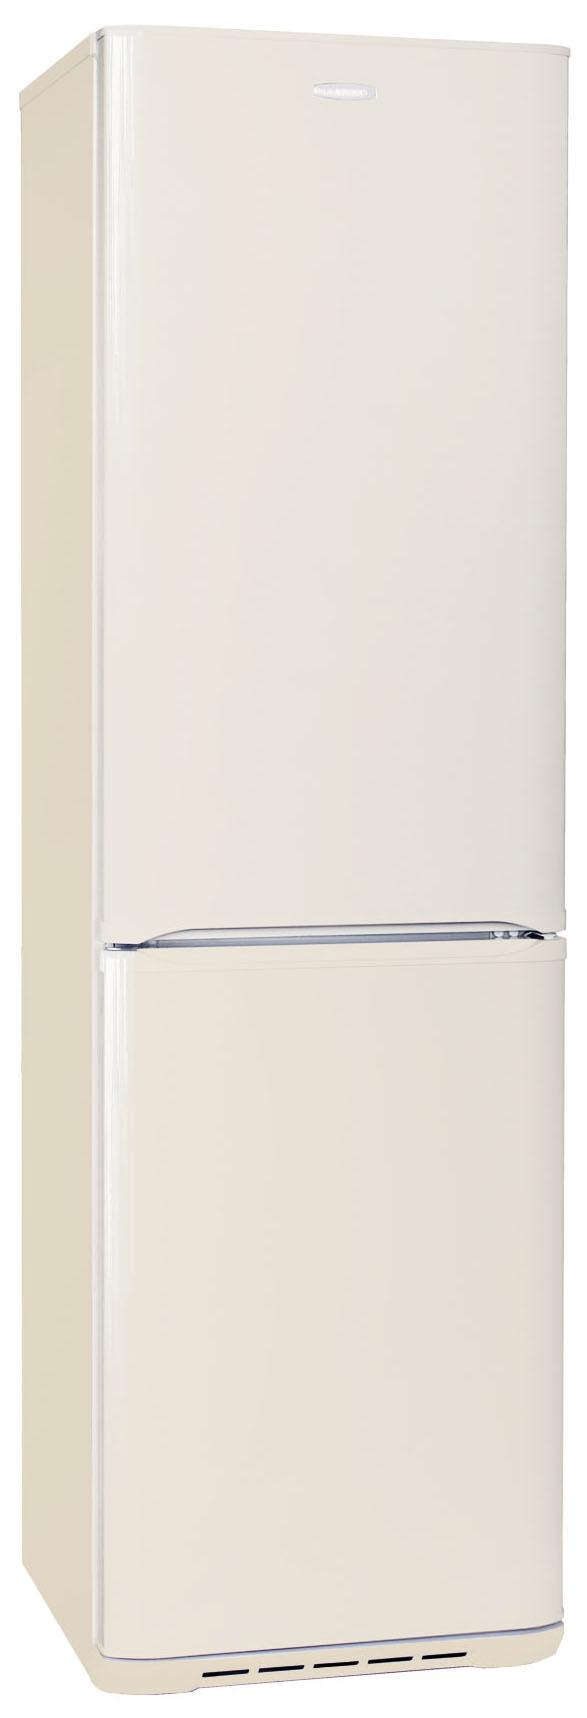 Холодильник Бирюса G149 Beige